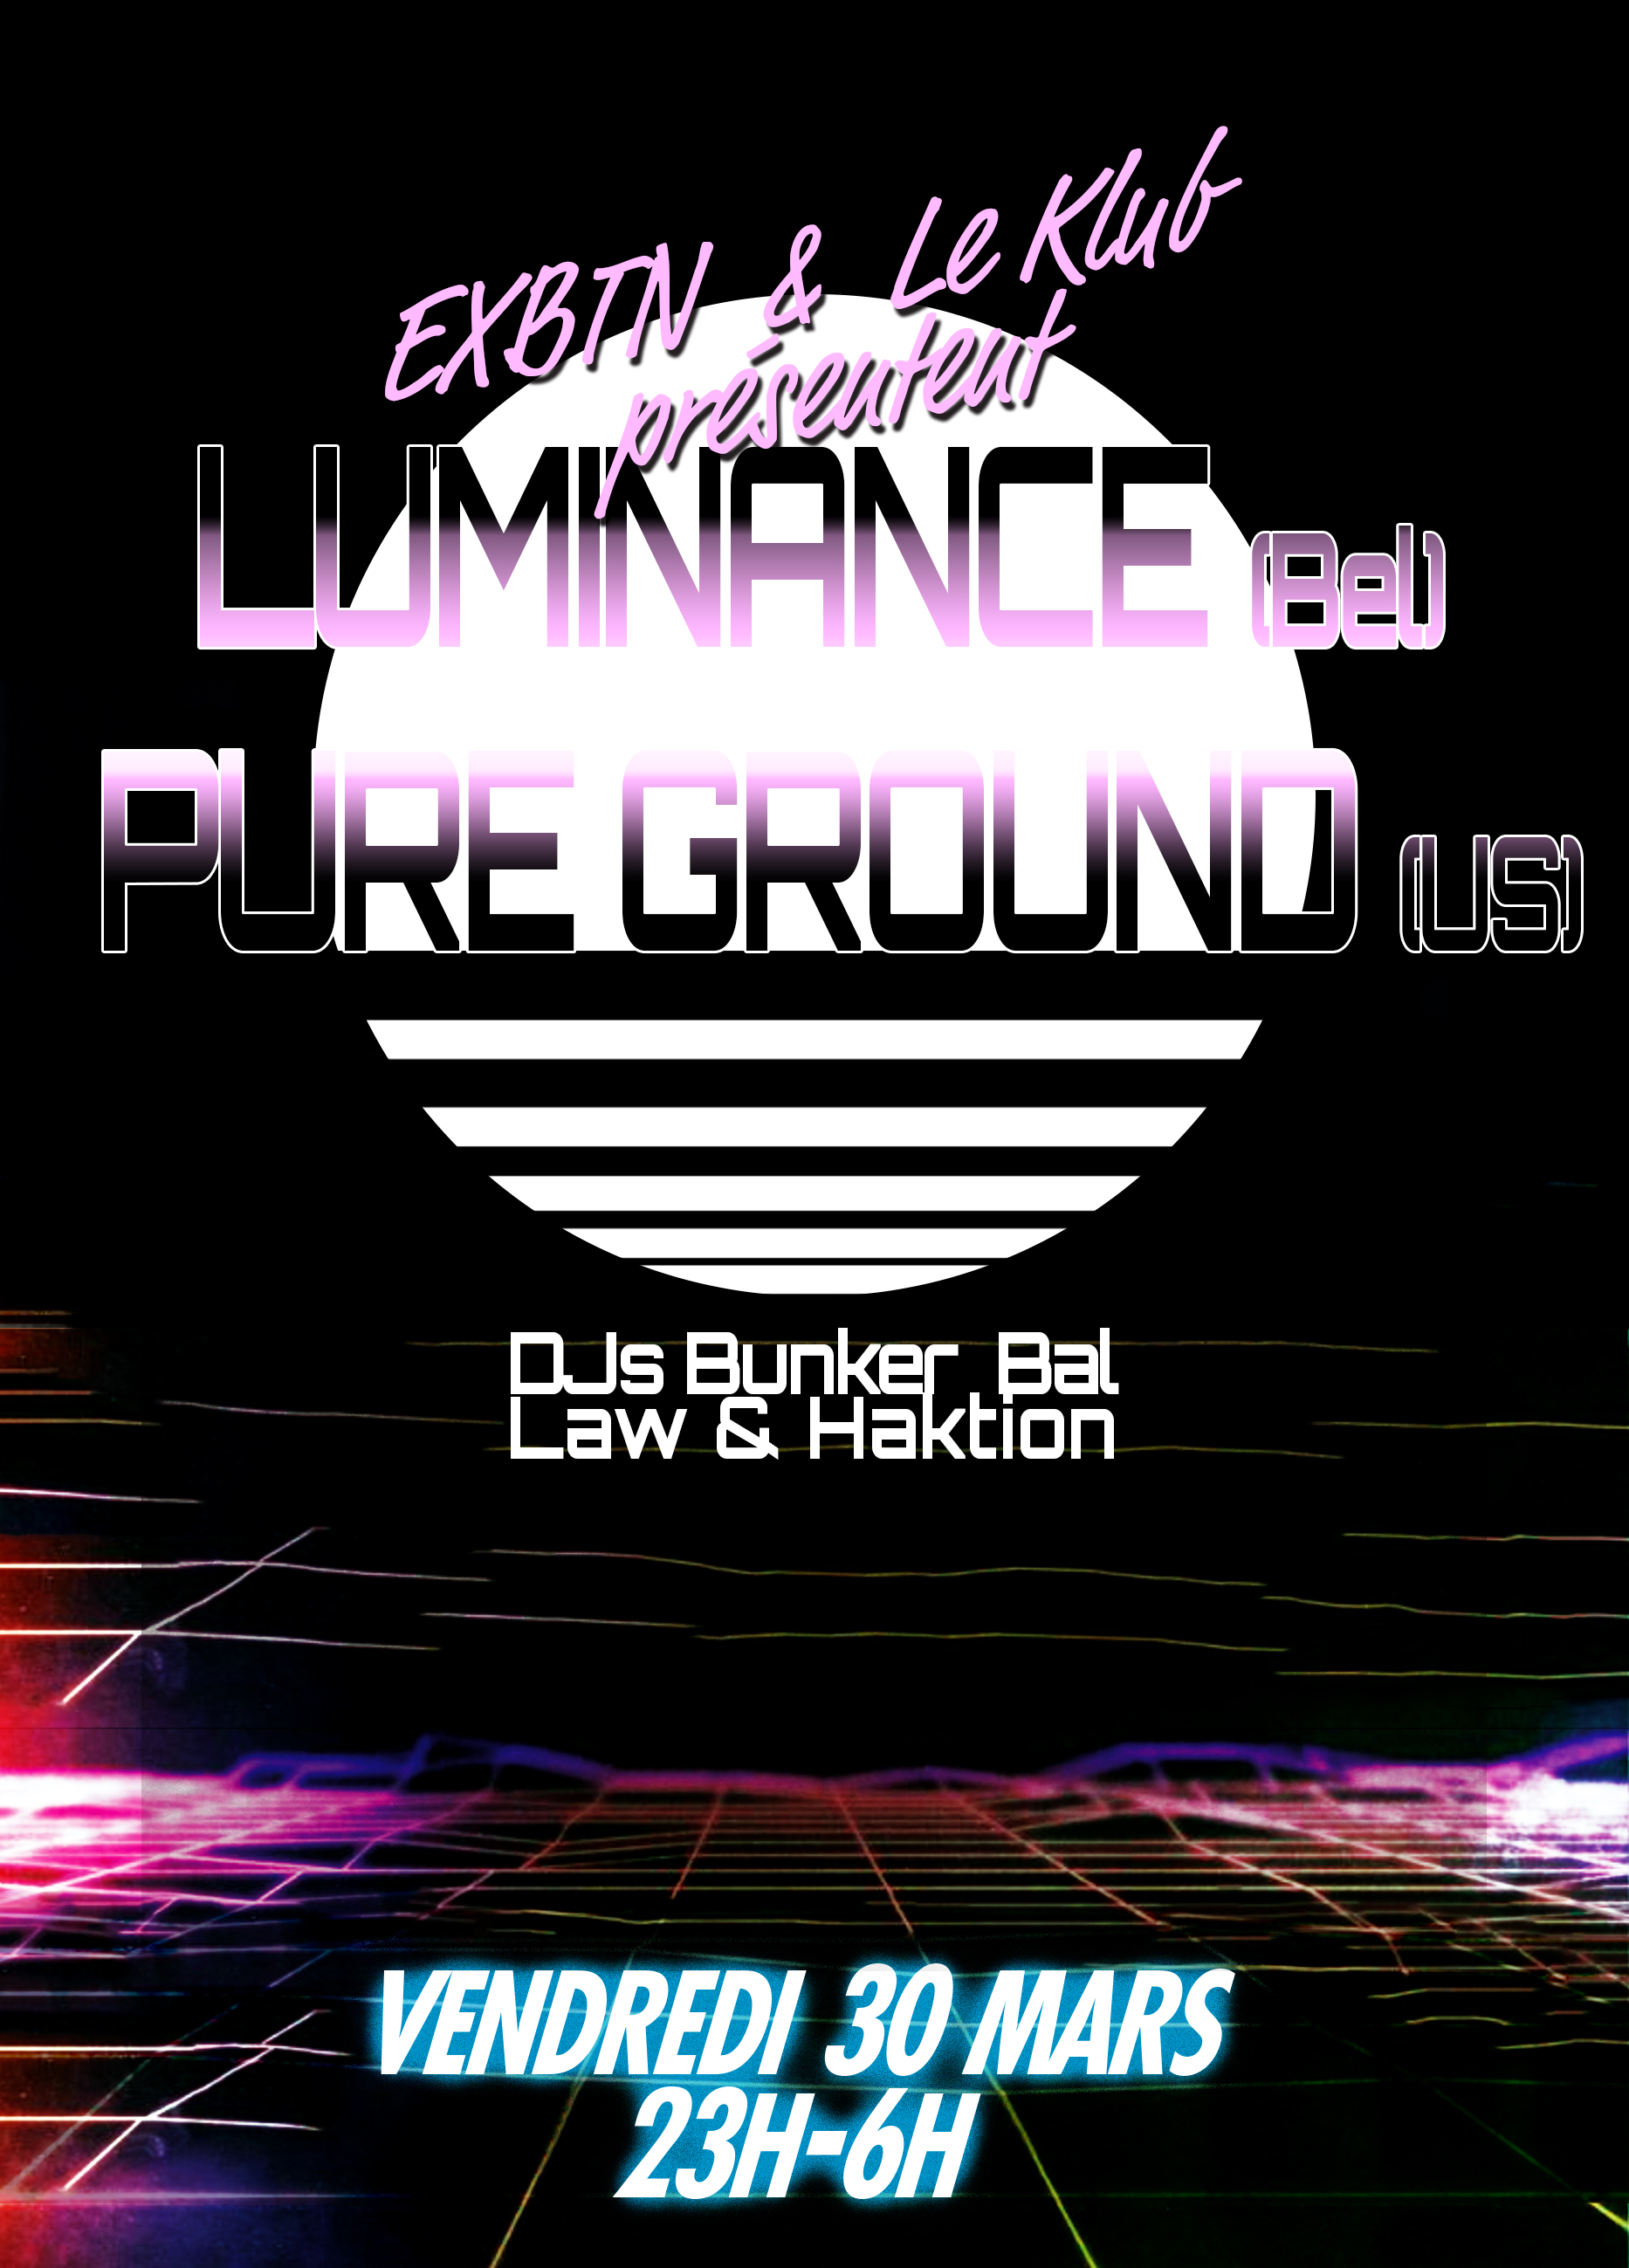 EXBTN PARTY ft. LUMINANCE & PURE GROUND ■ 30.03